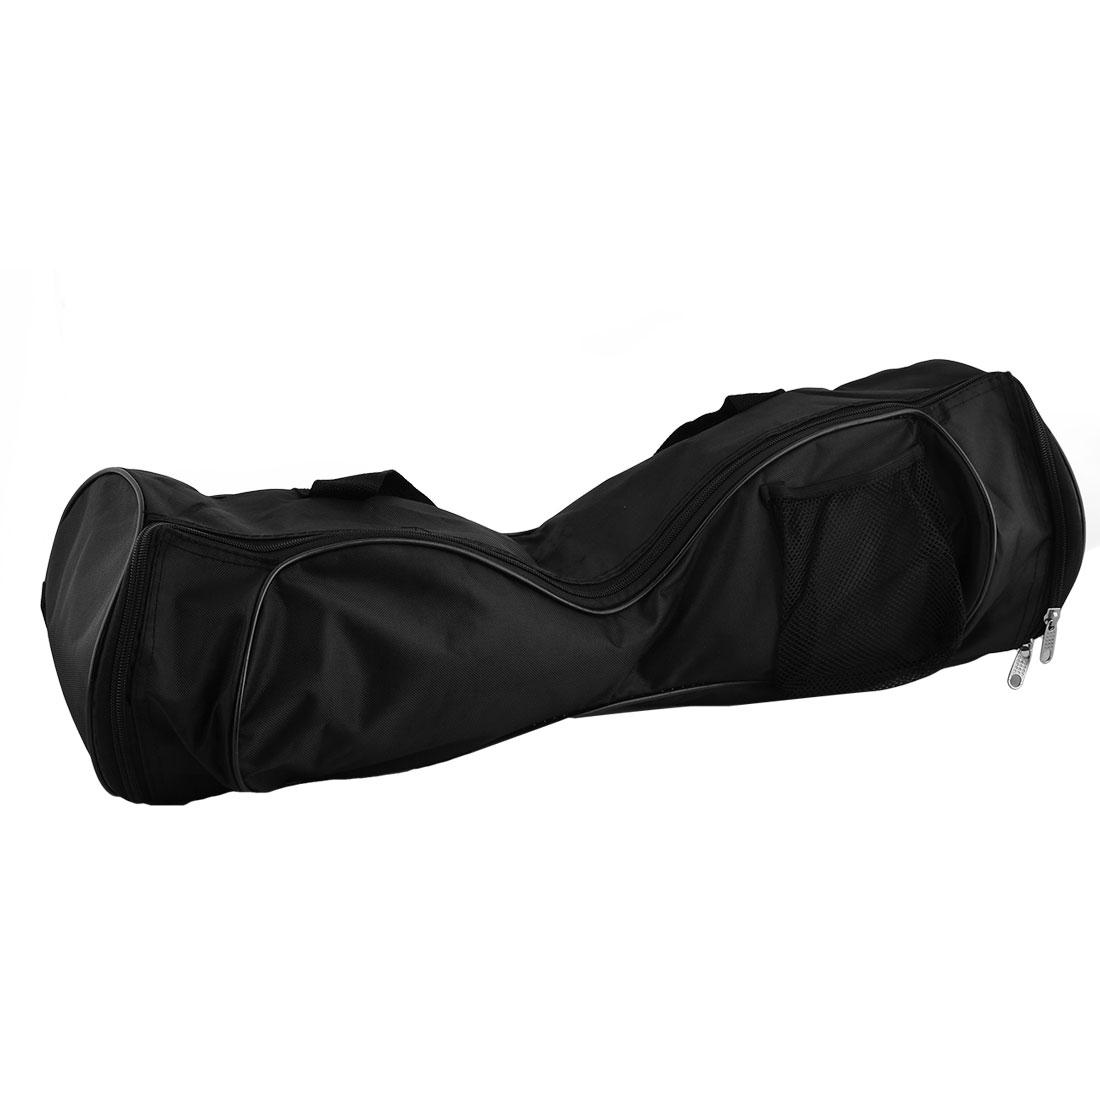 "Self Balancing Wheel 7.5"" Dia Carry Bag Case Backpack Black"